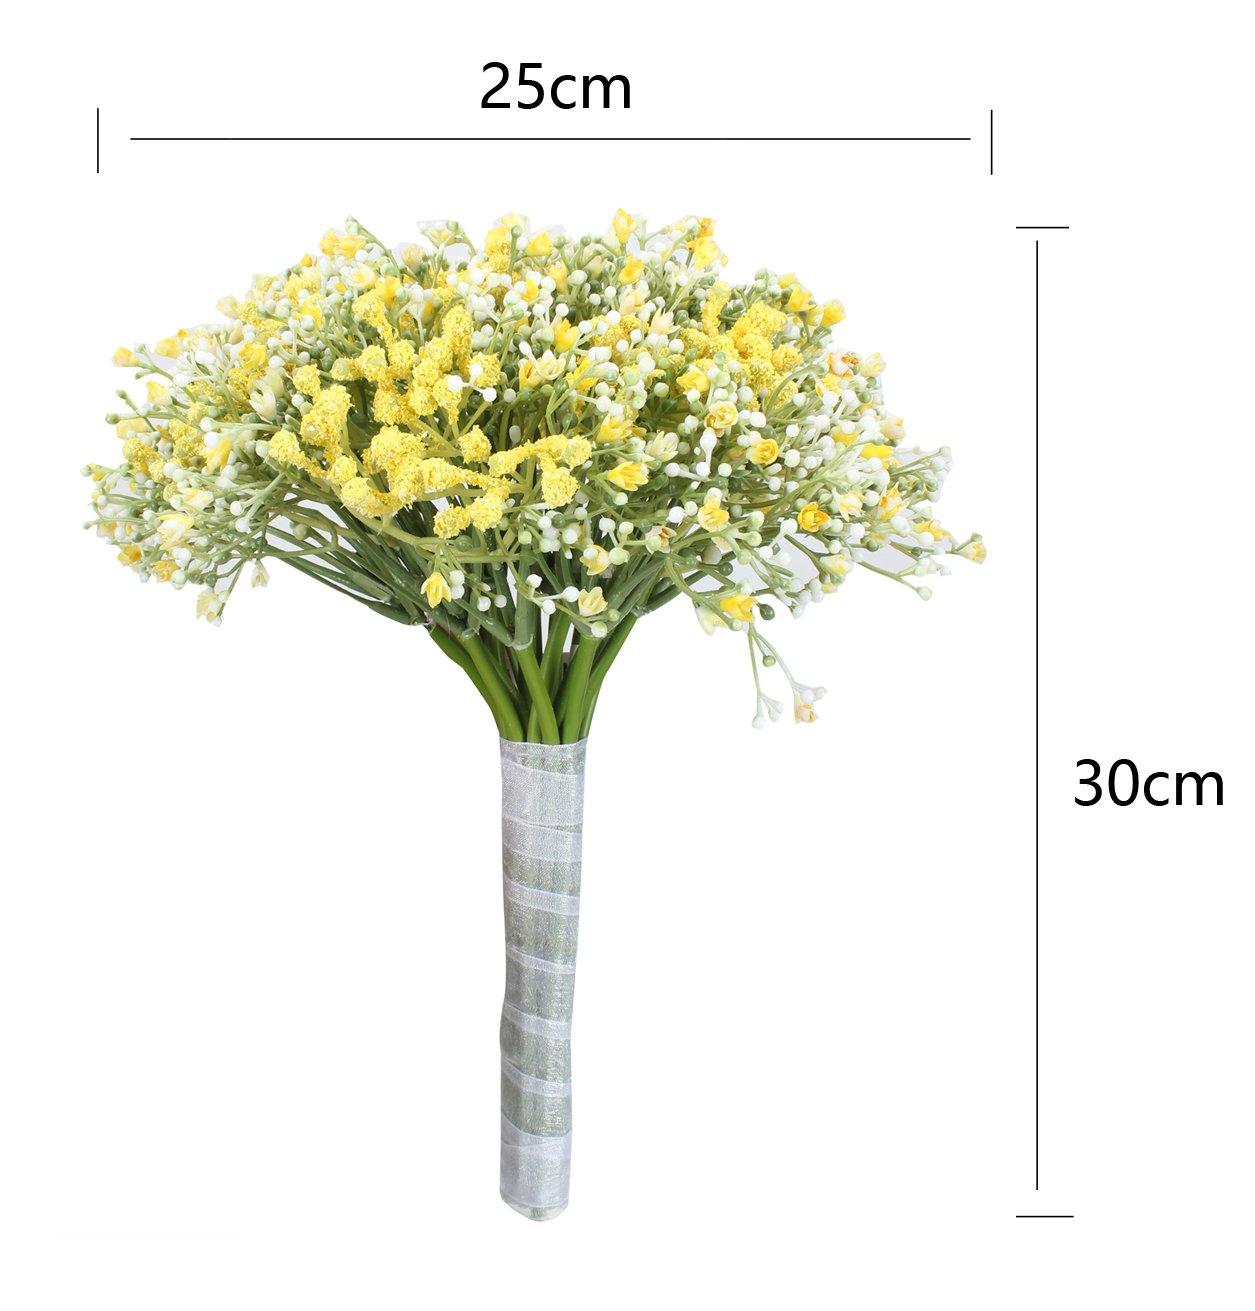 1//20Pcs Romantic Baby/'s Breath Gypsophila Silk Flower Party Wedding Home Décor